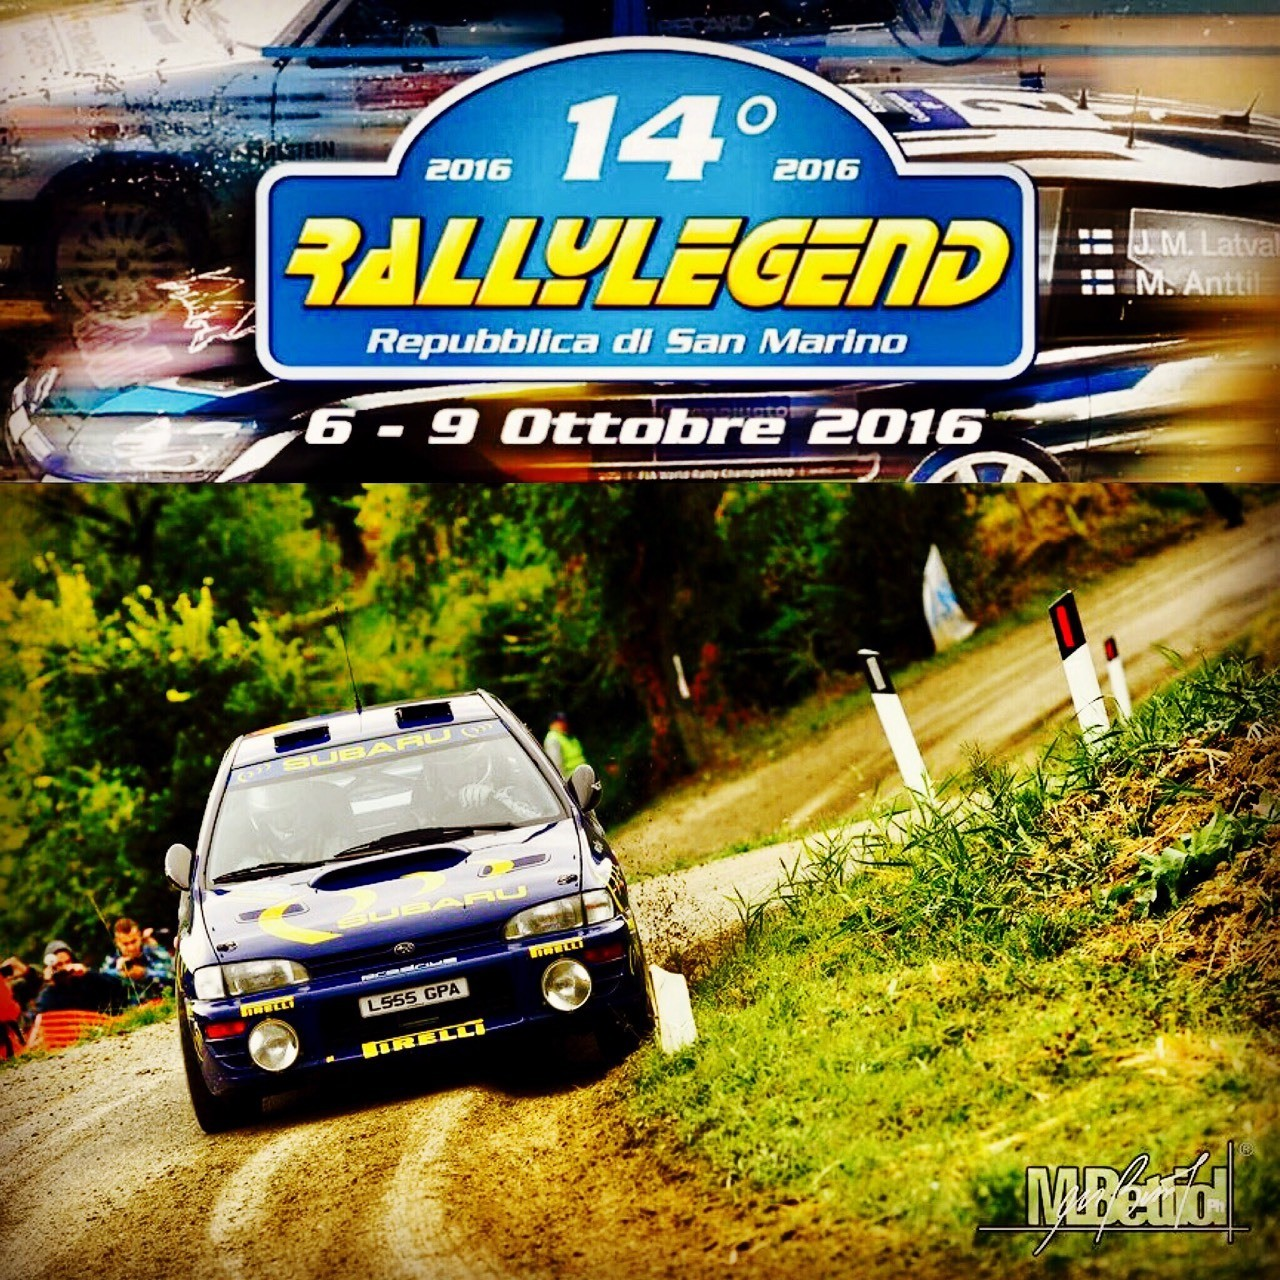 RALLYLEGEND seconda giornata di gara... Start ore 13:30 arrivo seconda tappa ore 19:00. #AndreaNavarra #BillyCasazza #subaruwrx #rallylegend